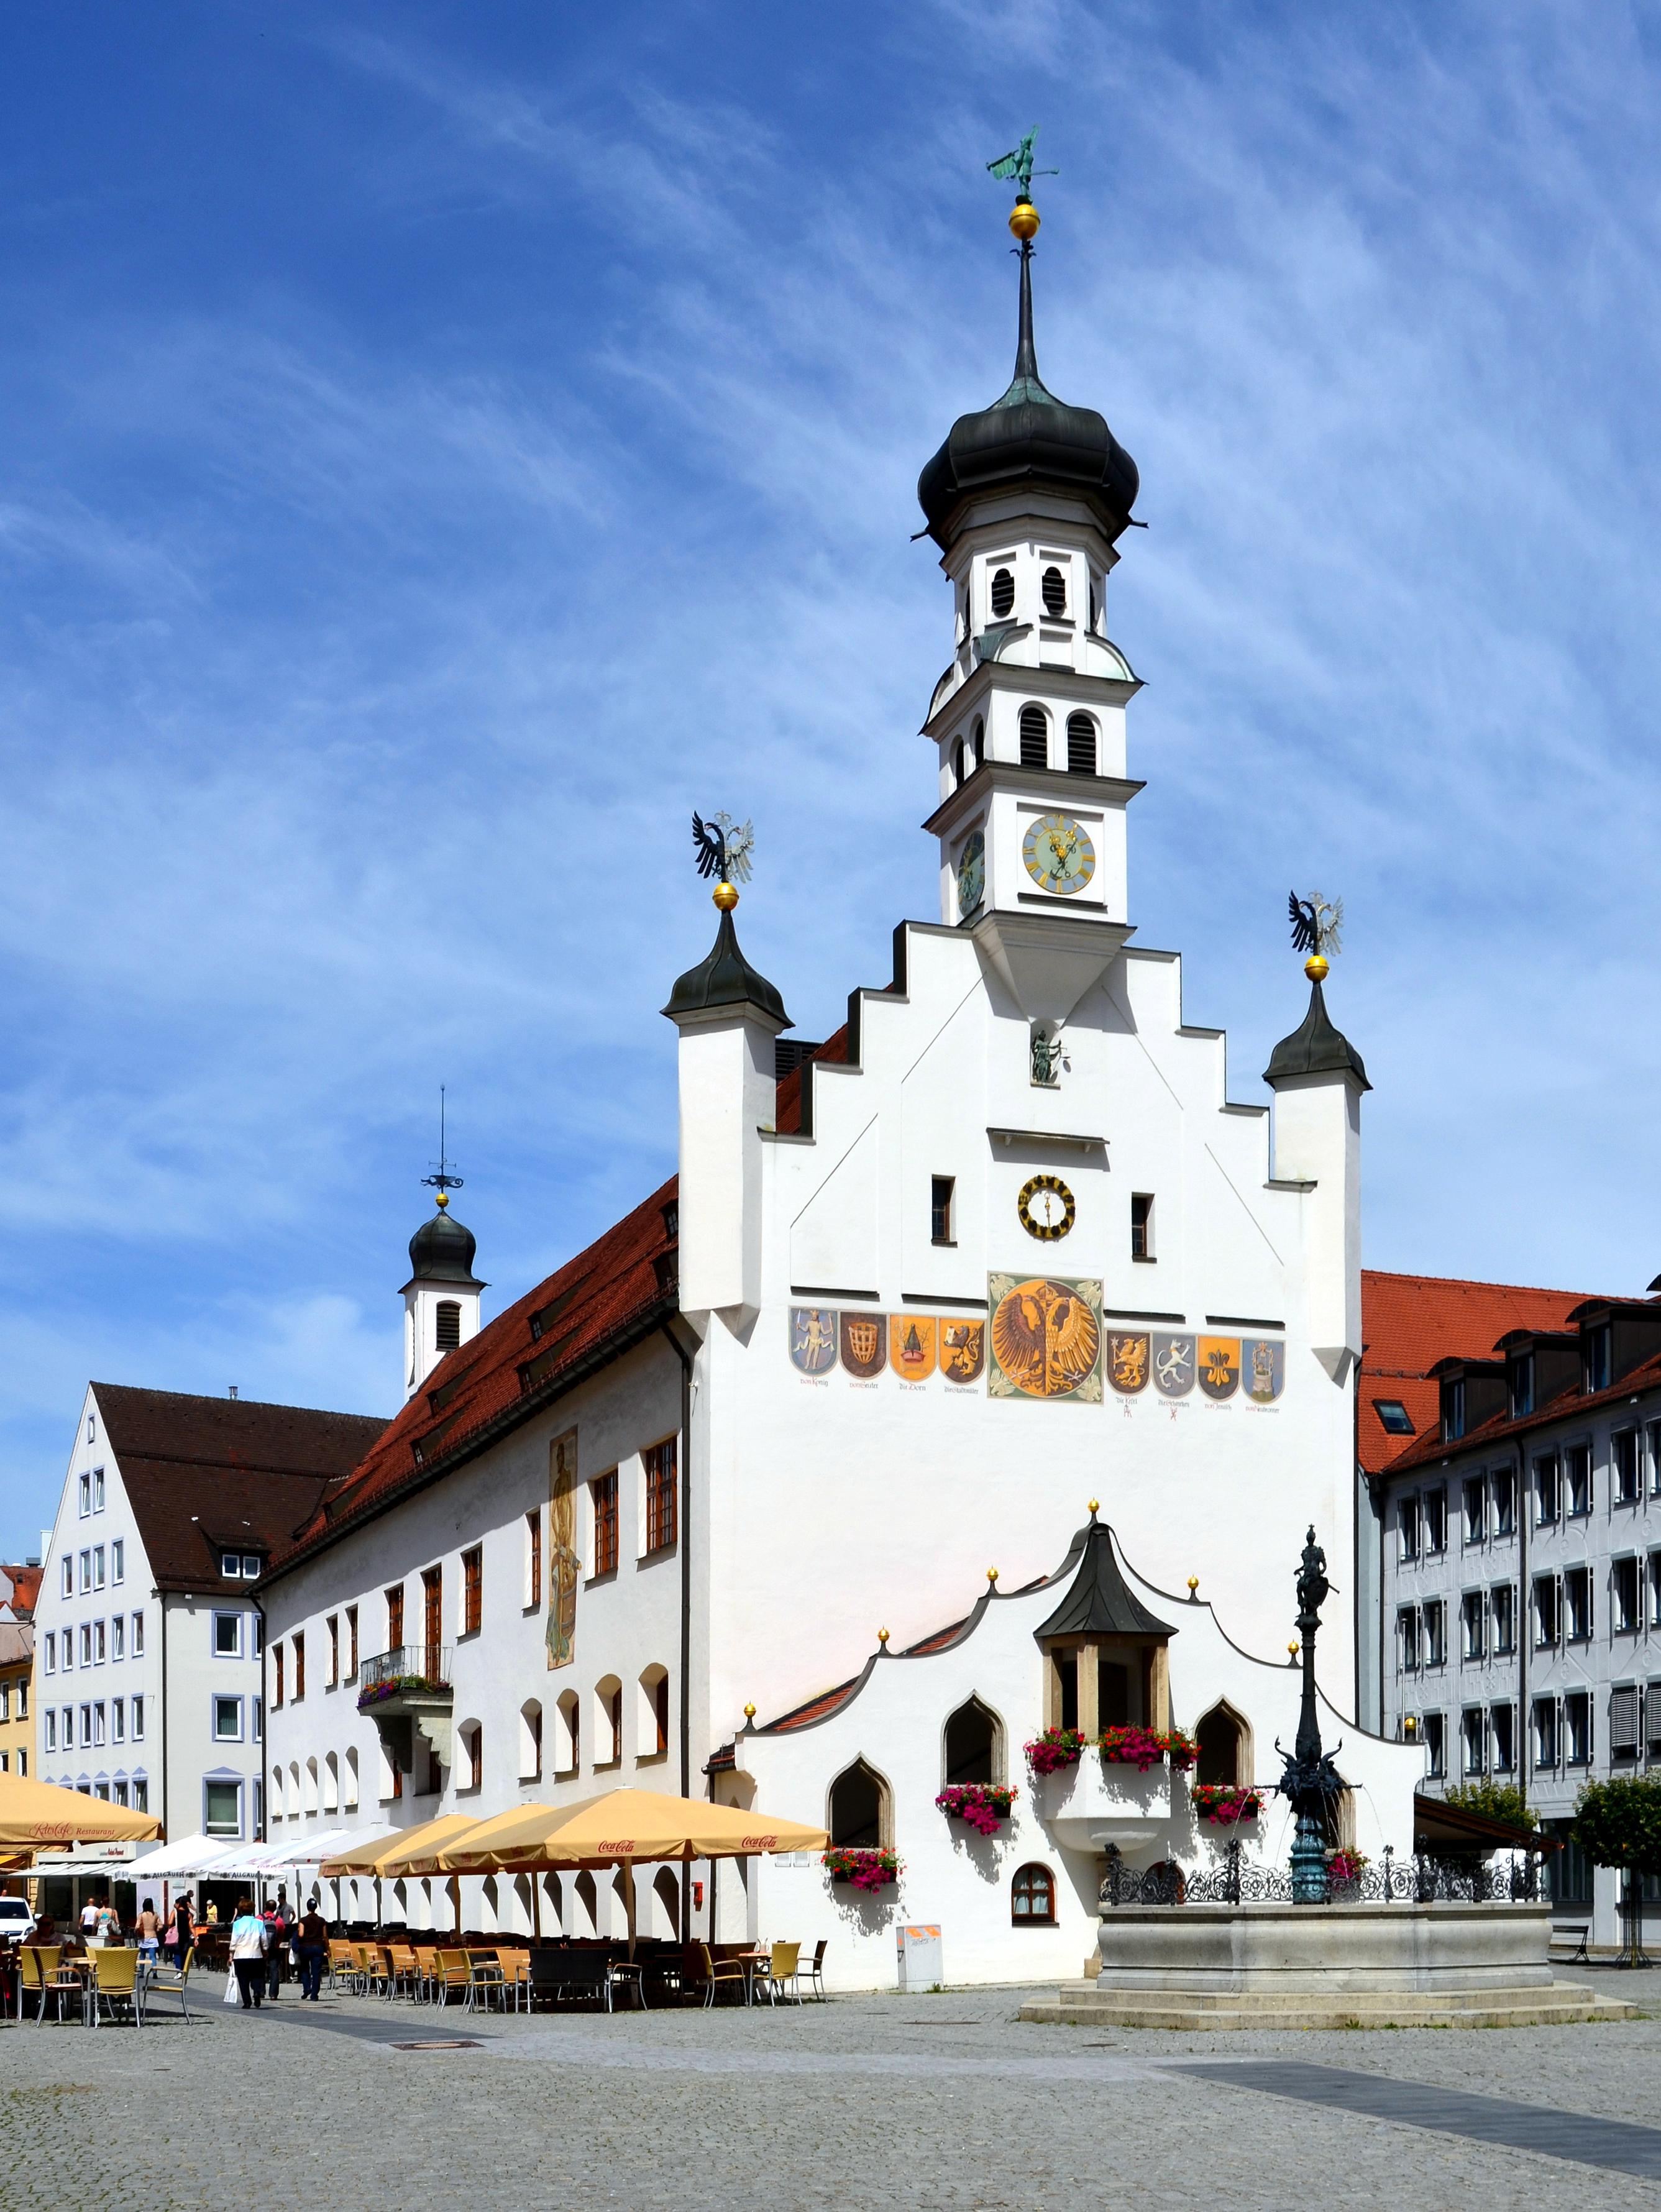 Kempten Germany  city photo : ... Germany on Pinterest | Kaiserslautern, Playmobil and Bavaria germany